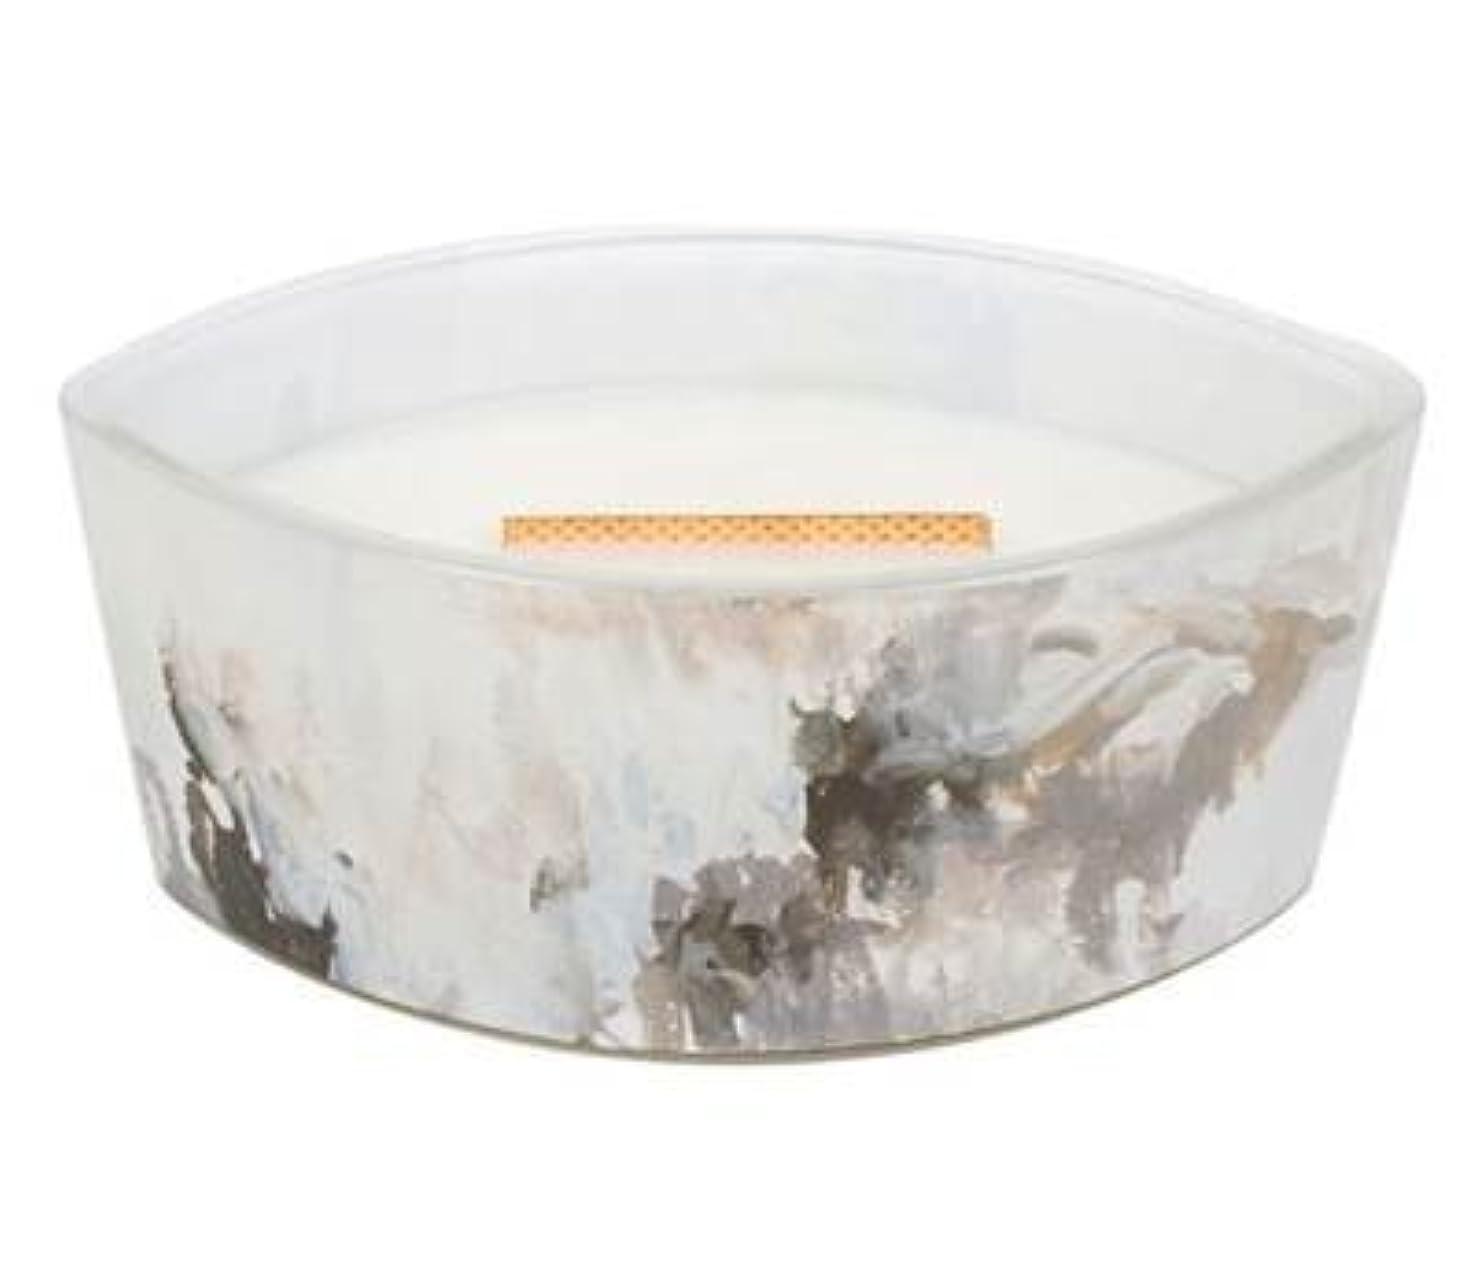 Honey Tabac – アーティザンコレクション楕円WoodWick香りつきJar Candle